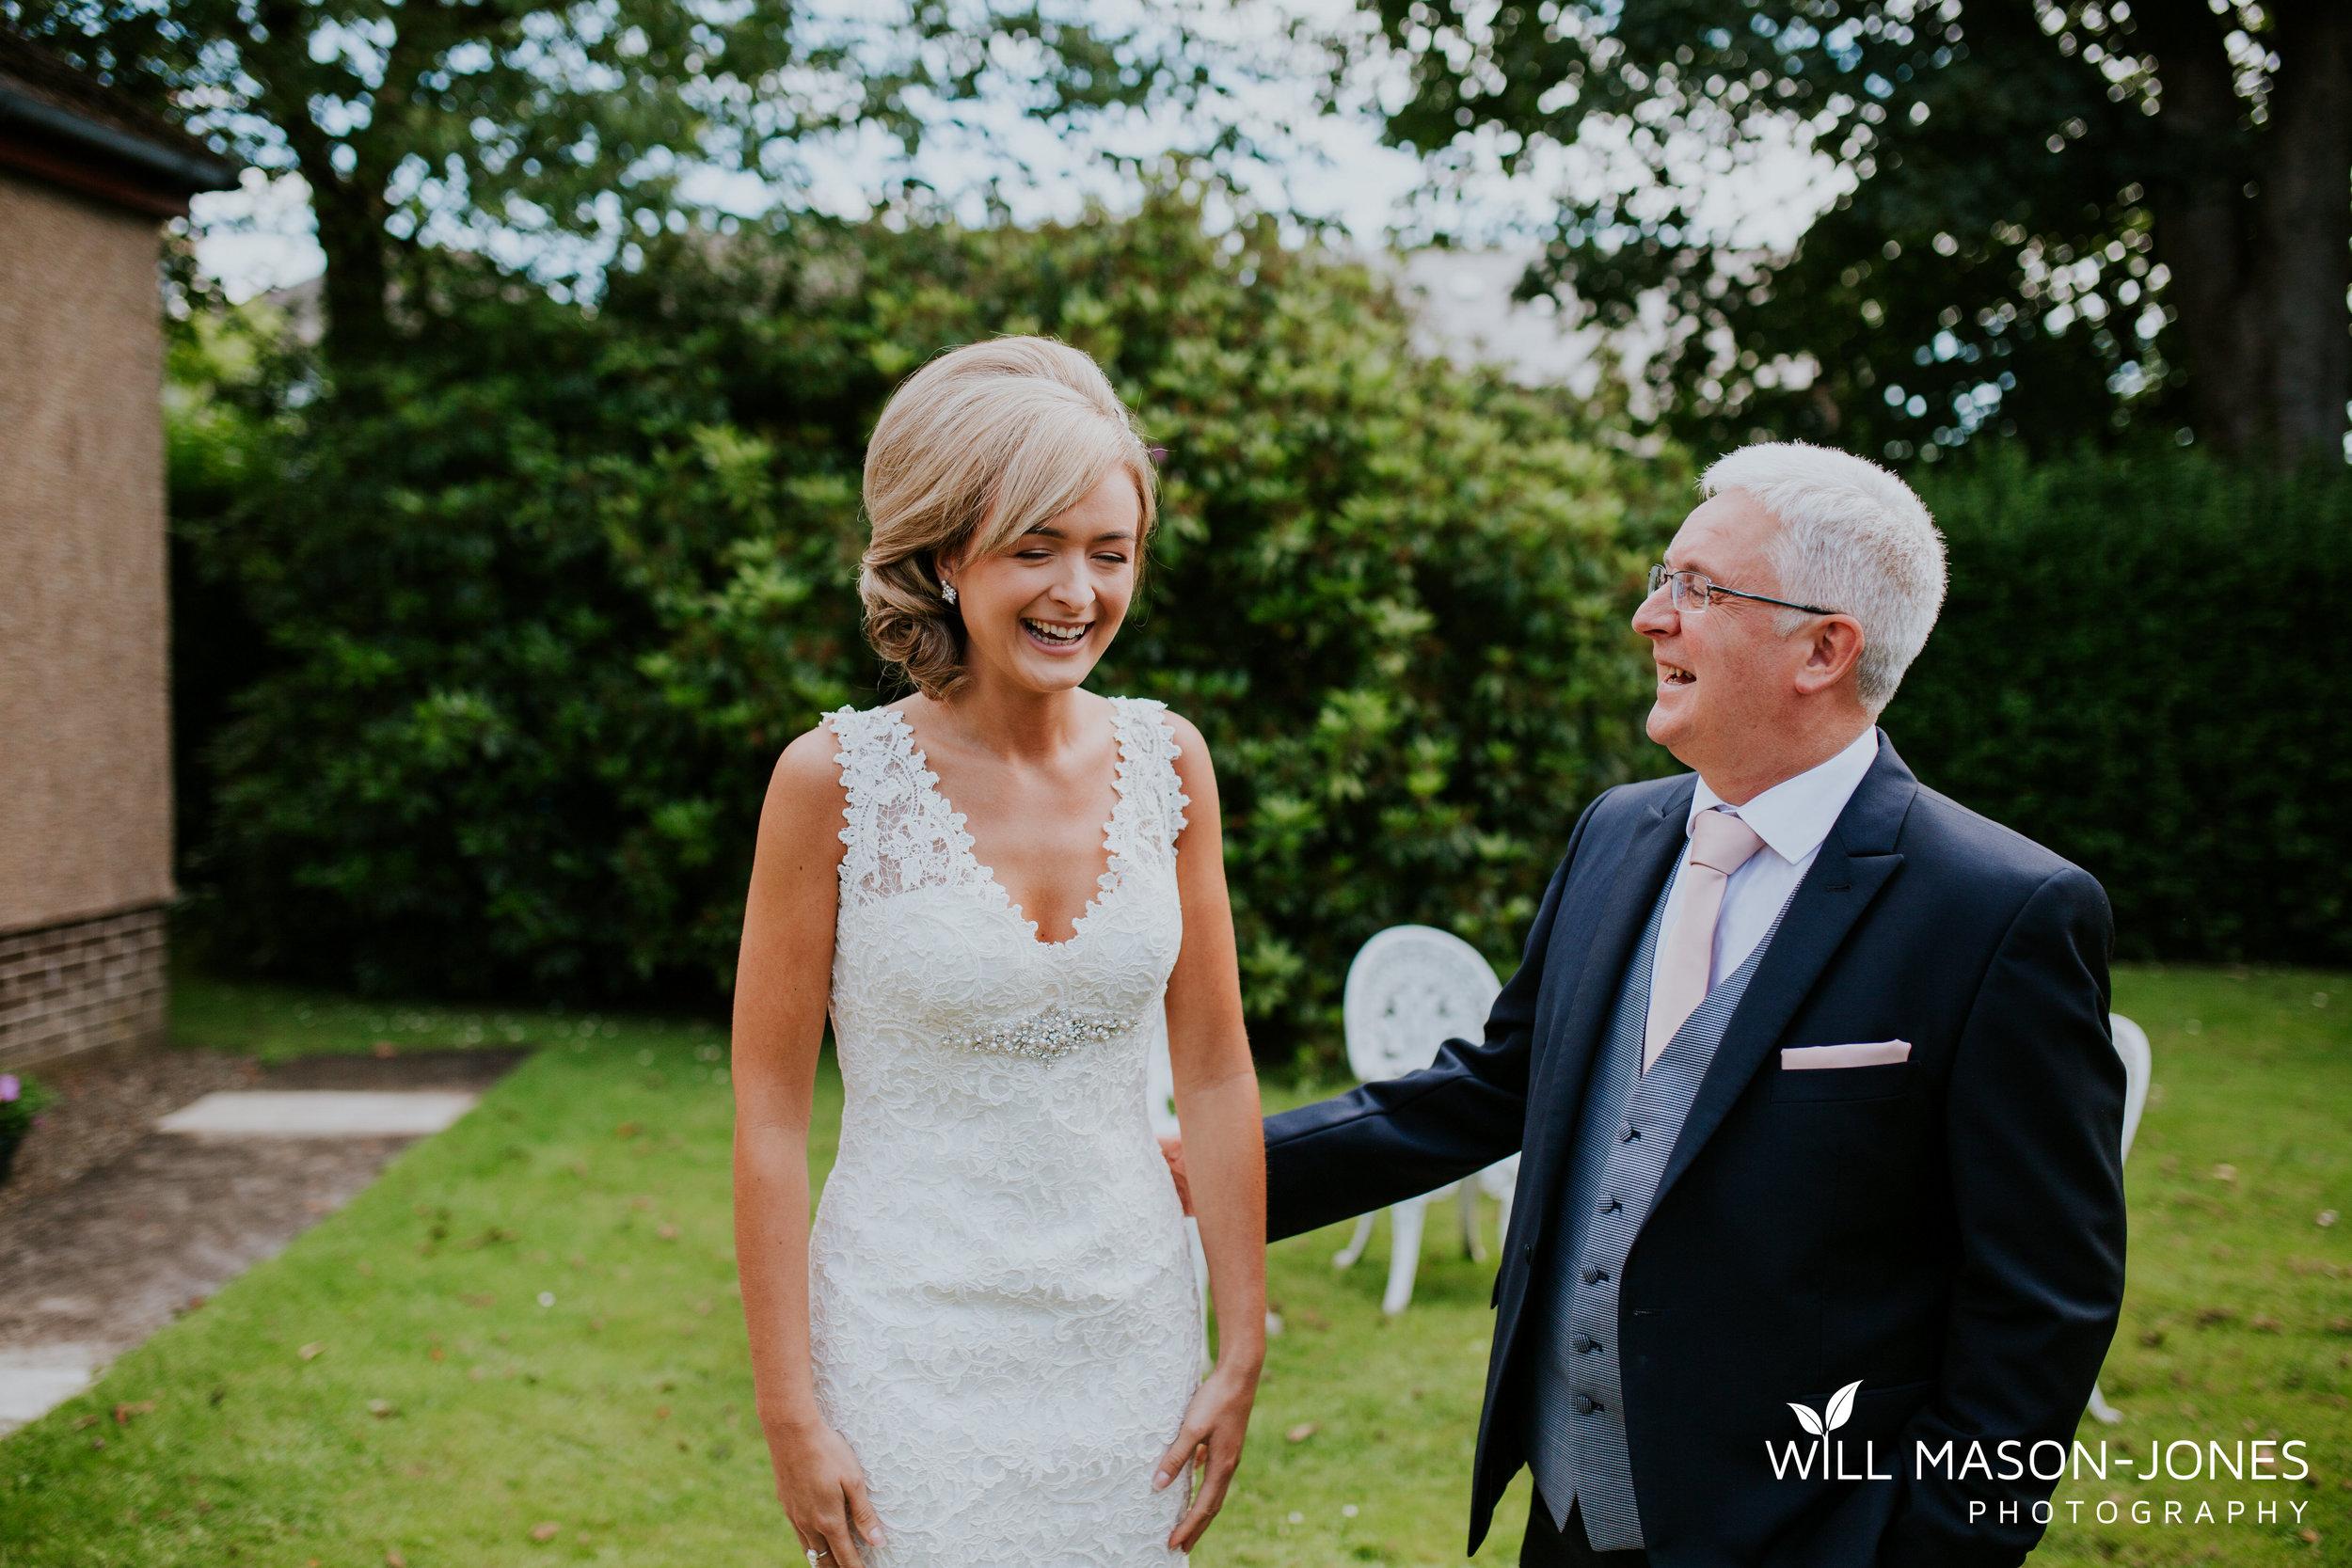 loch-lomond-destination-wedding-photographer-scotland-uk-wales-24.jpg